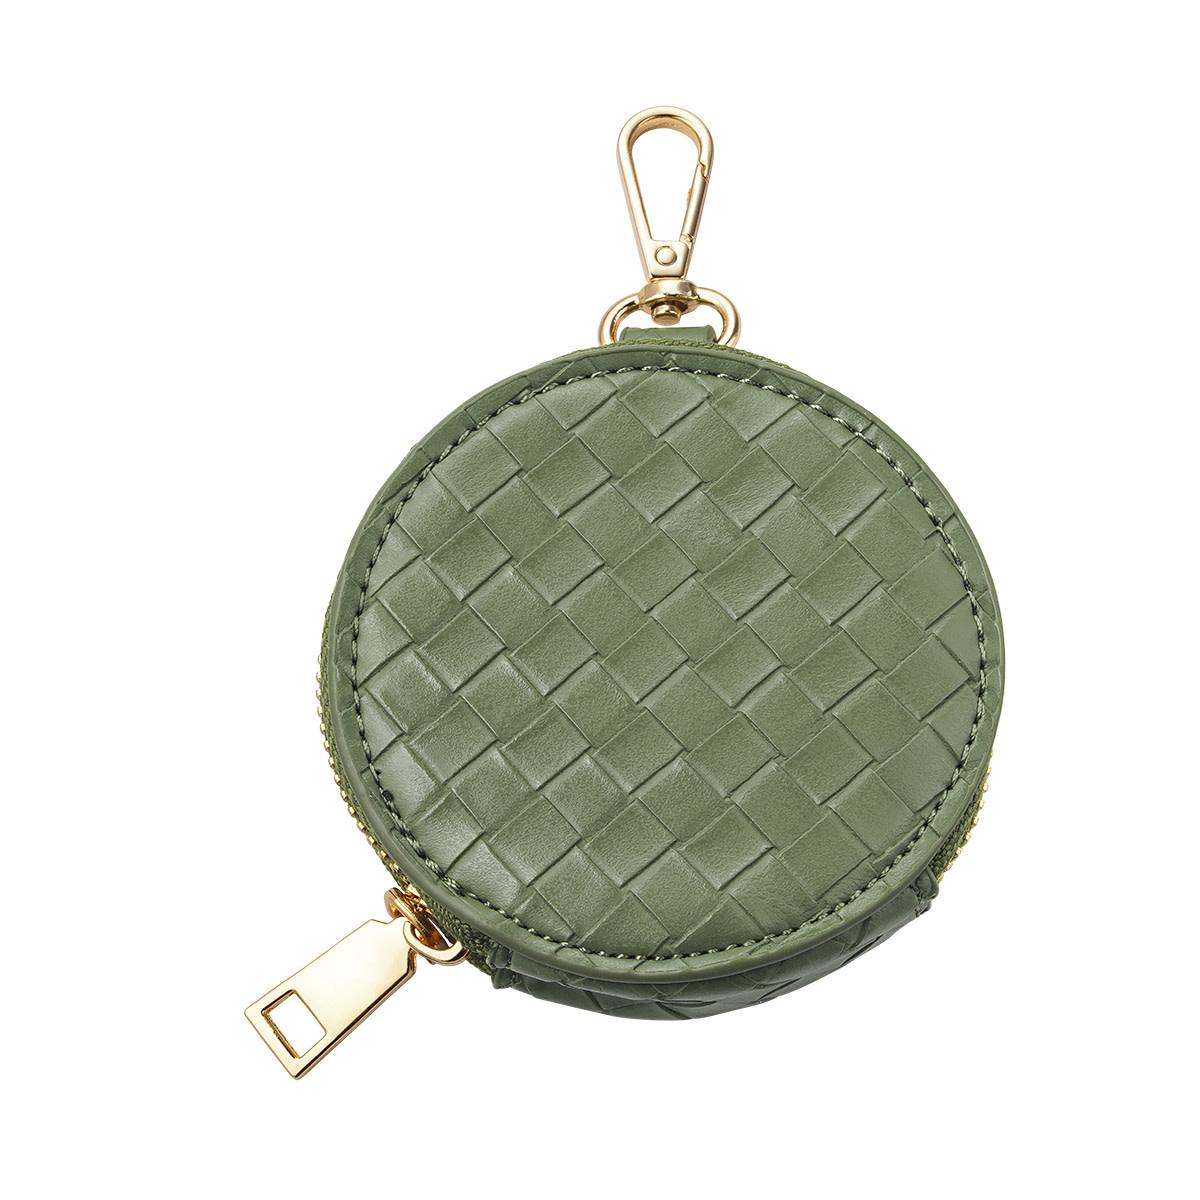 With love Braided pouch - khaki green 9 x 2 cm